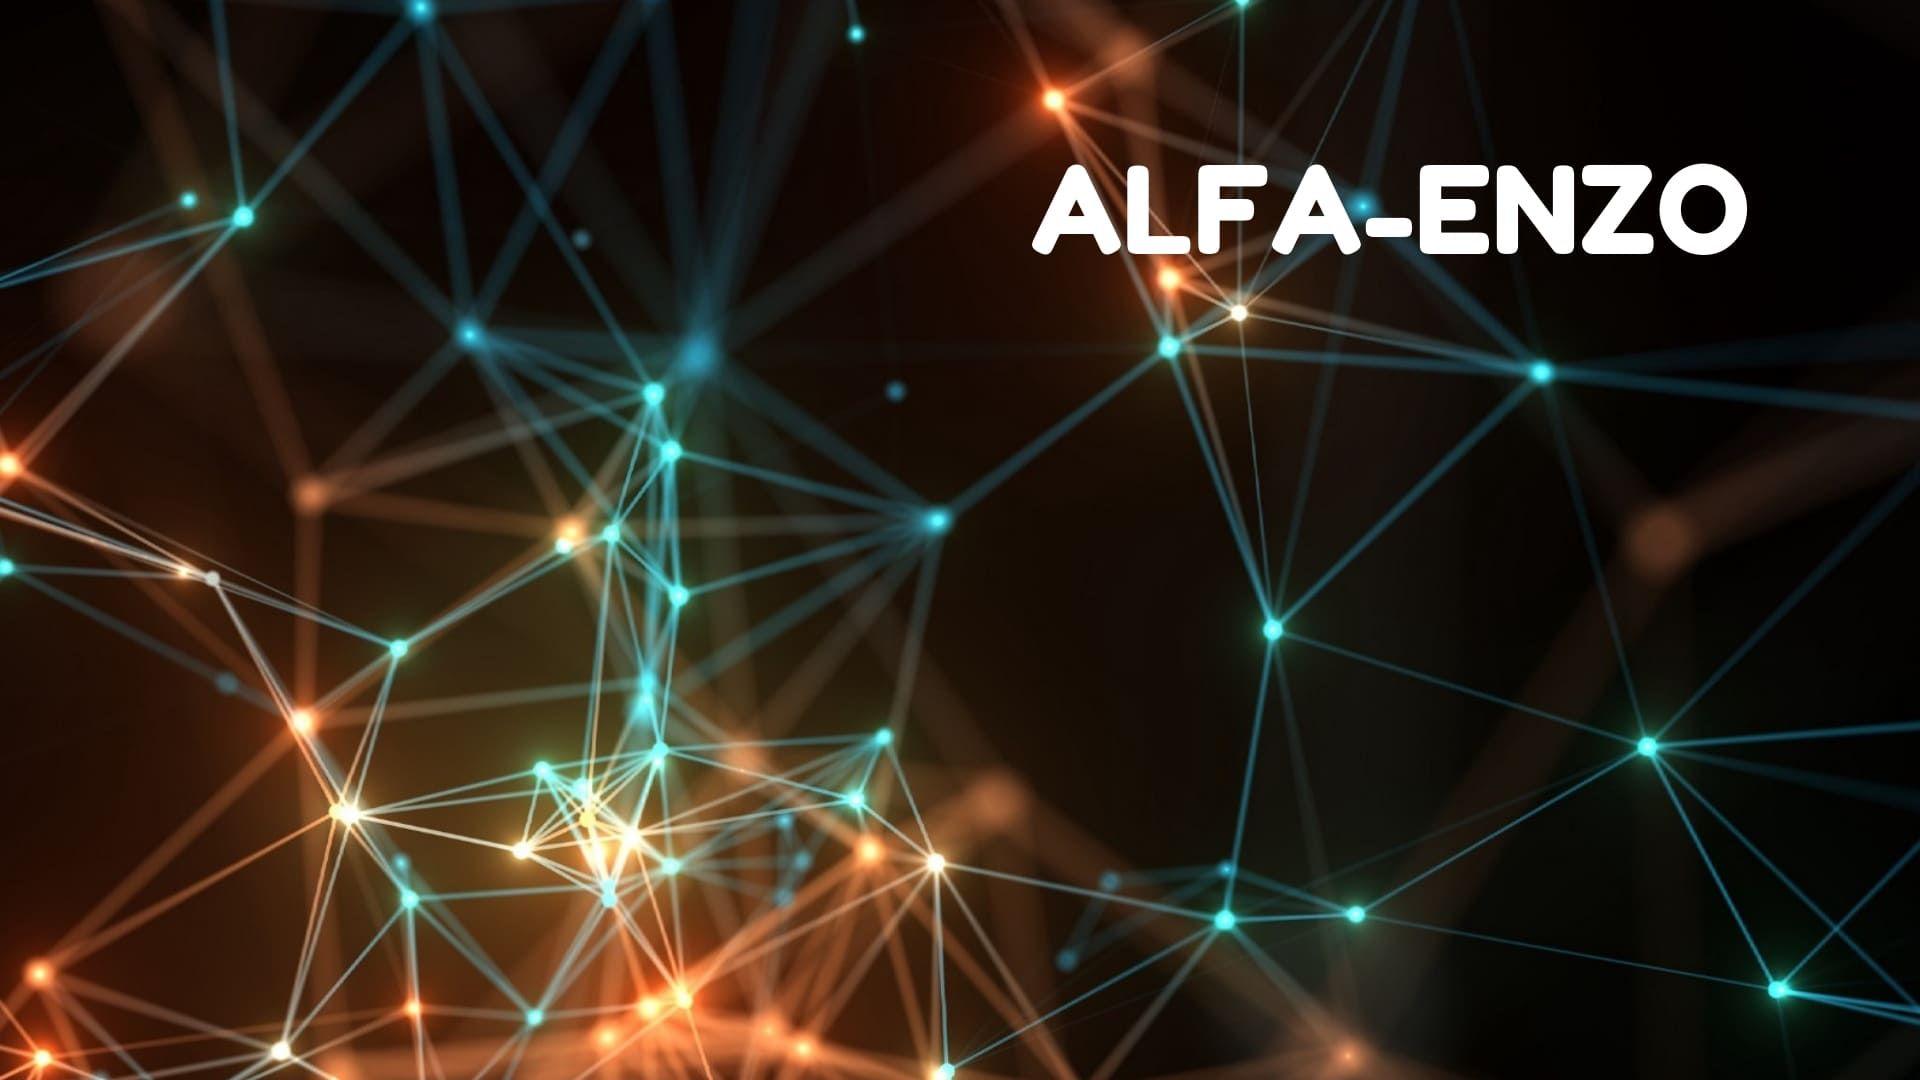 ALFA-ENZO (2) (1).jpg